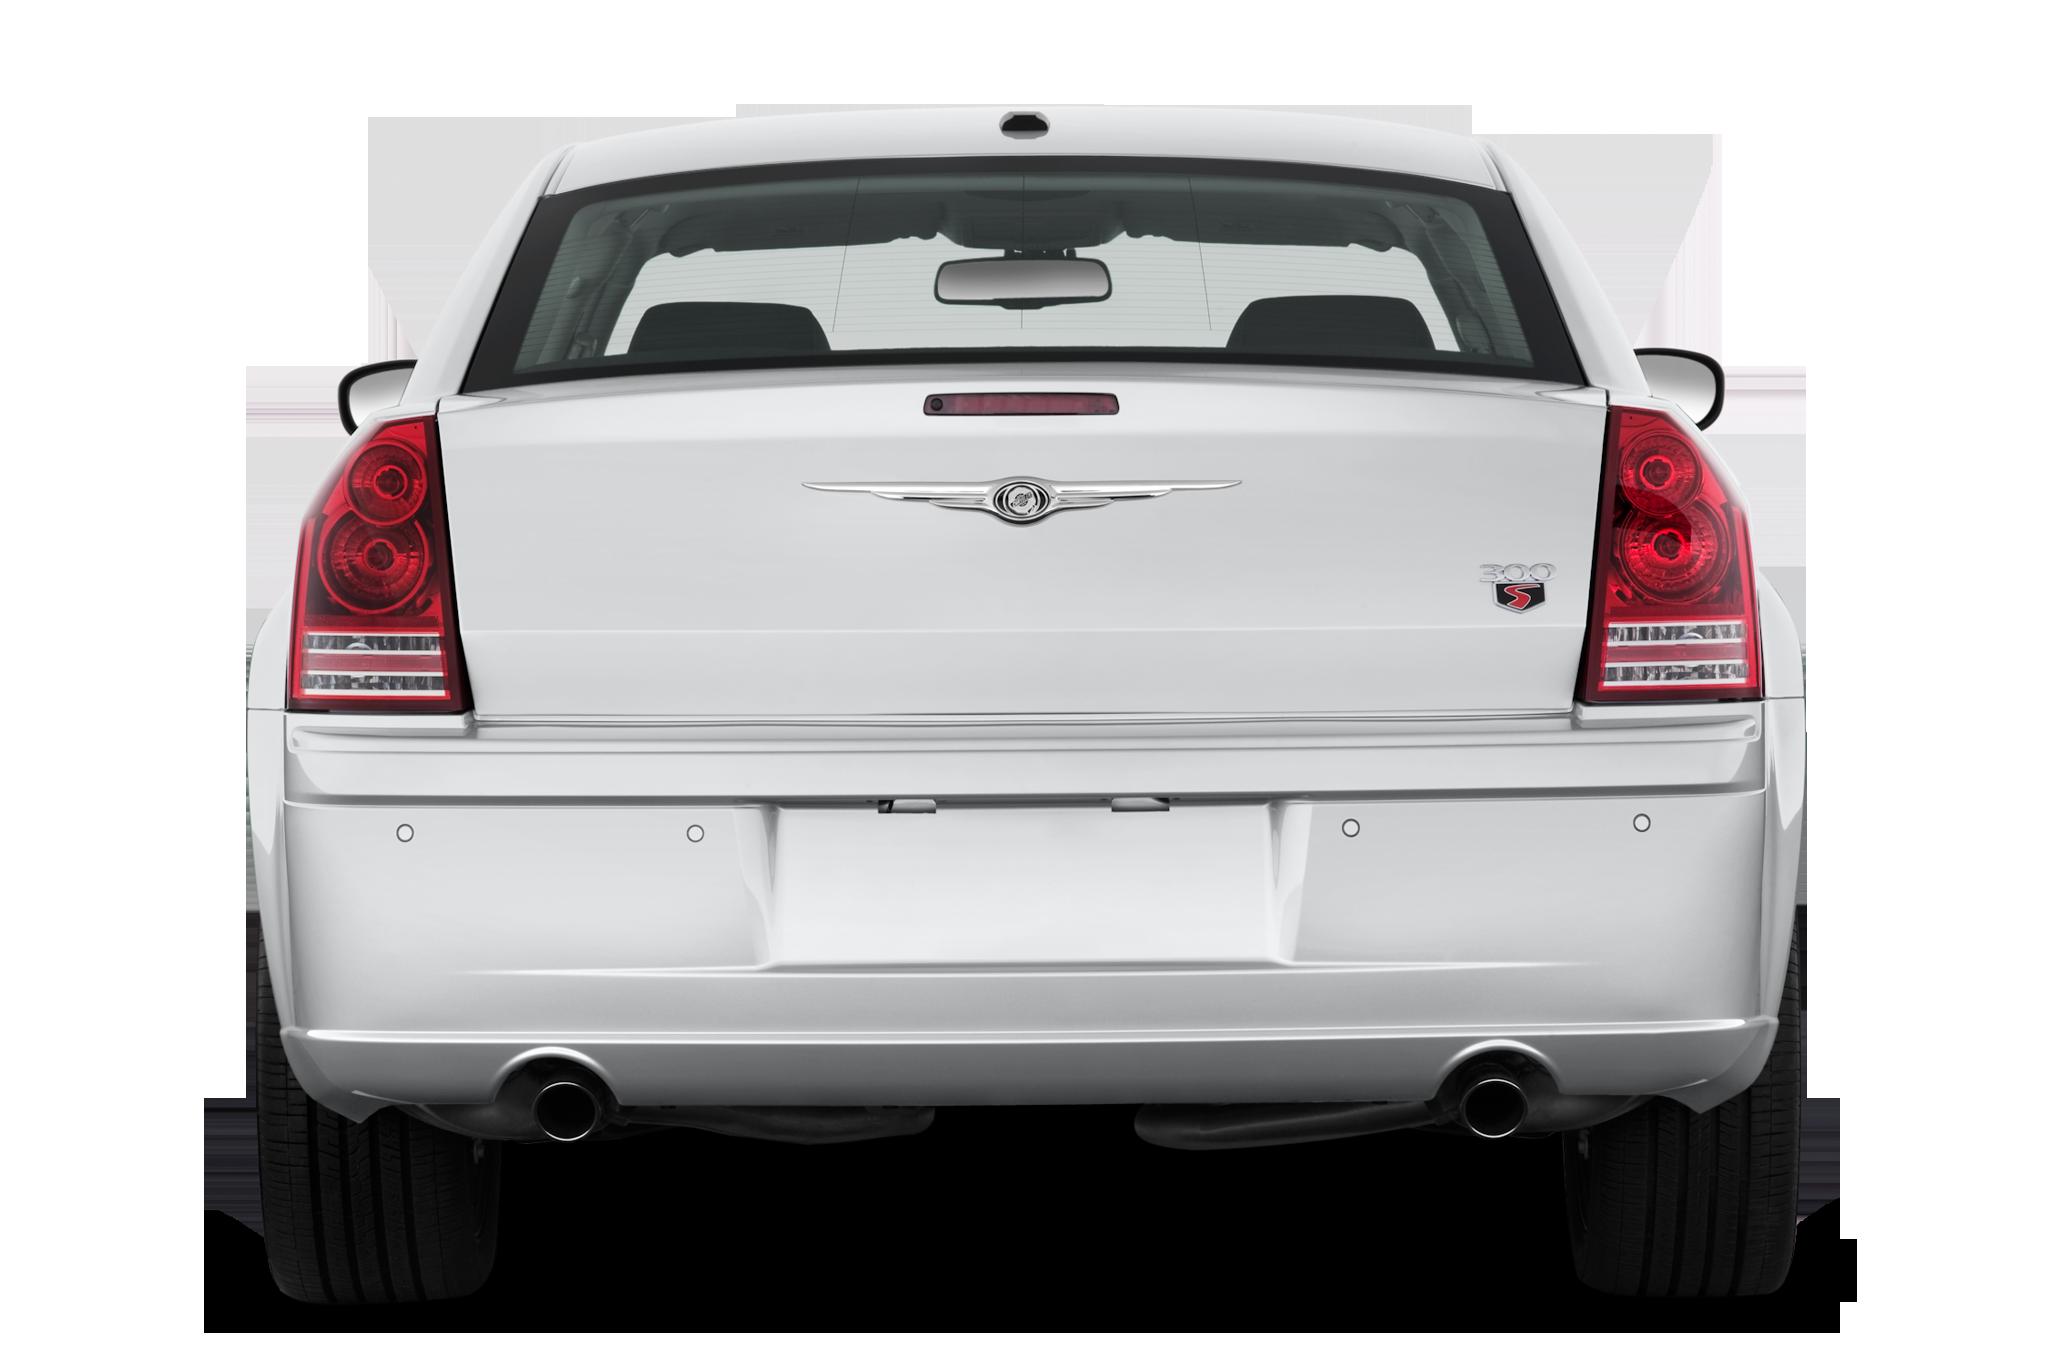 2010 chrysler 300 s v8 sedan rear view recall central chrysler recalls expand to wrangler, minivans; bmw  at alyssarenee.co